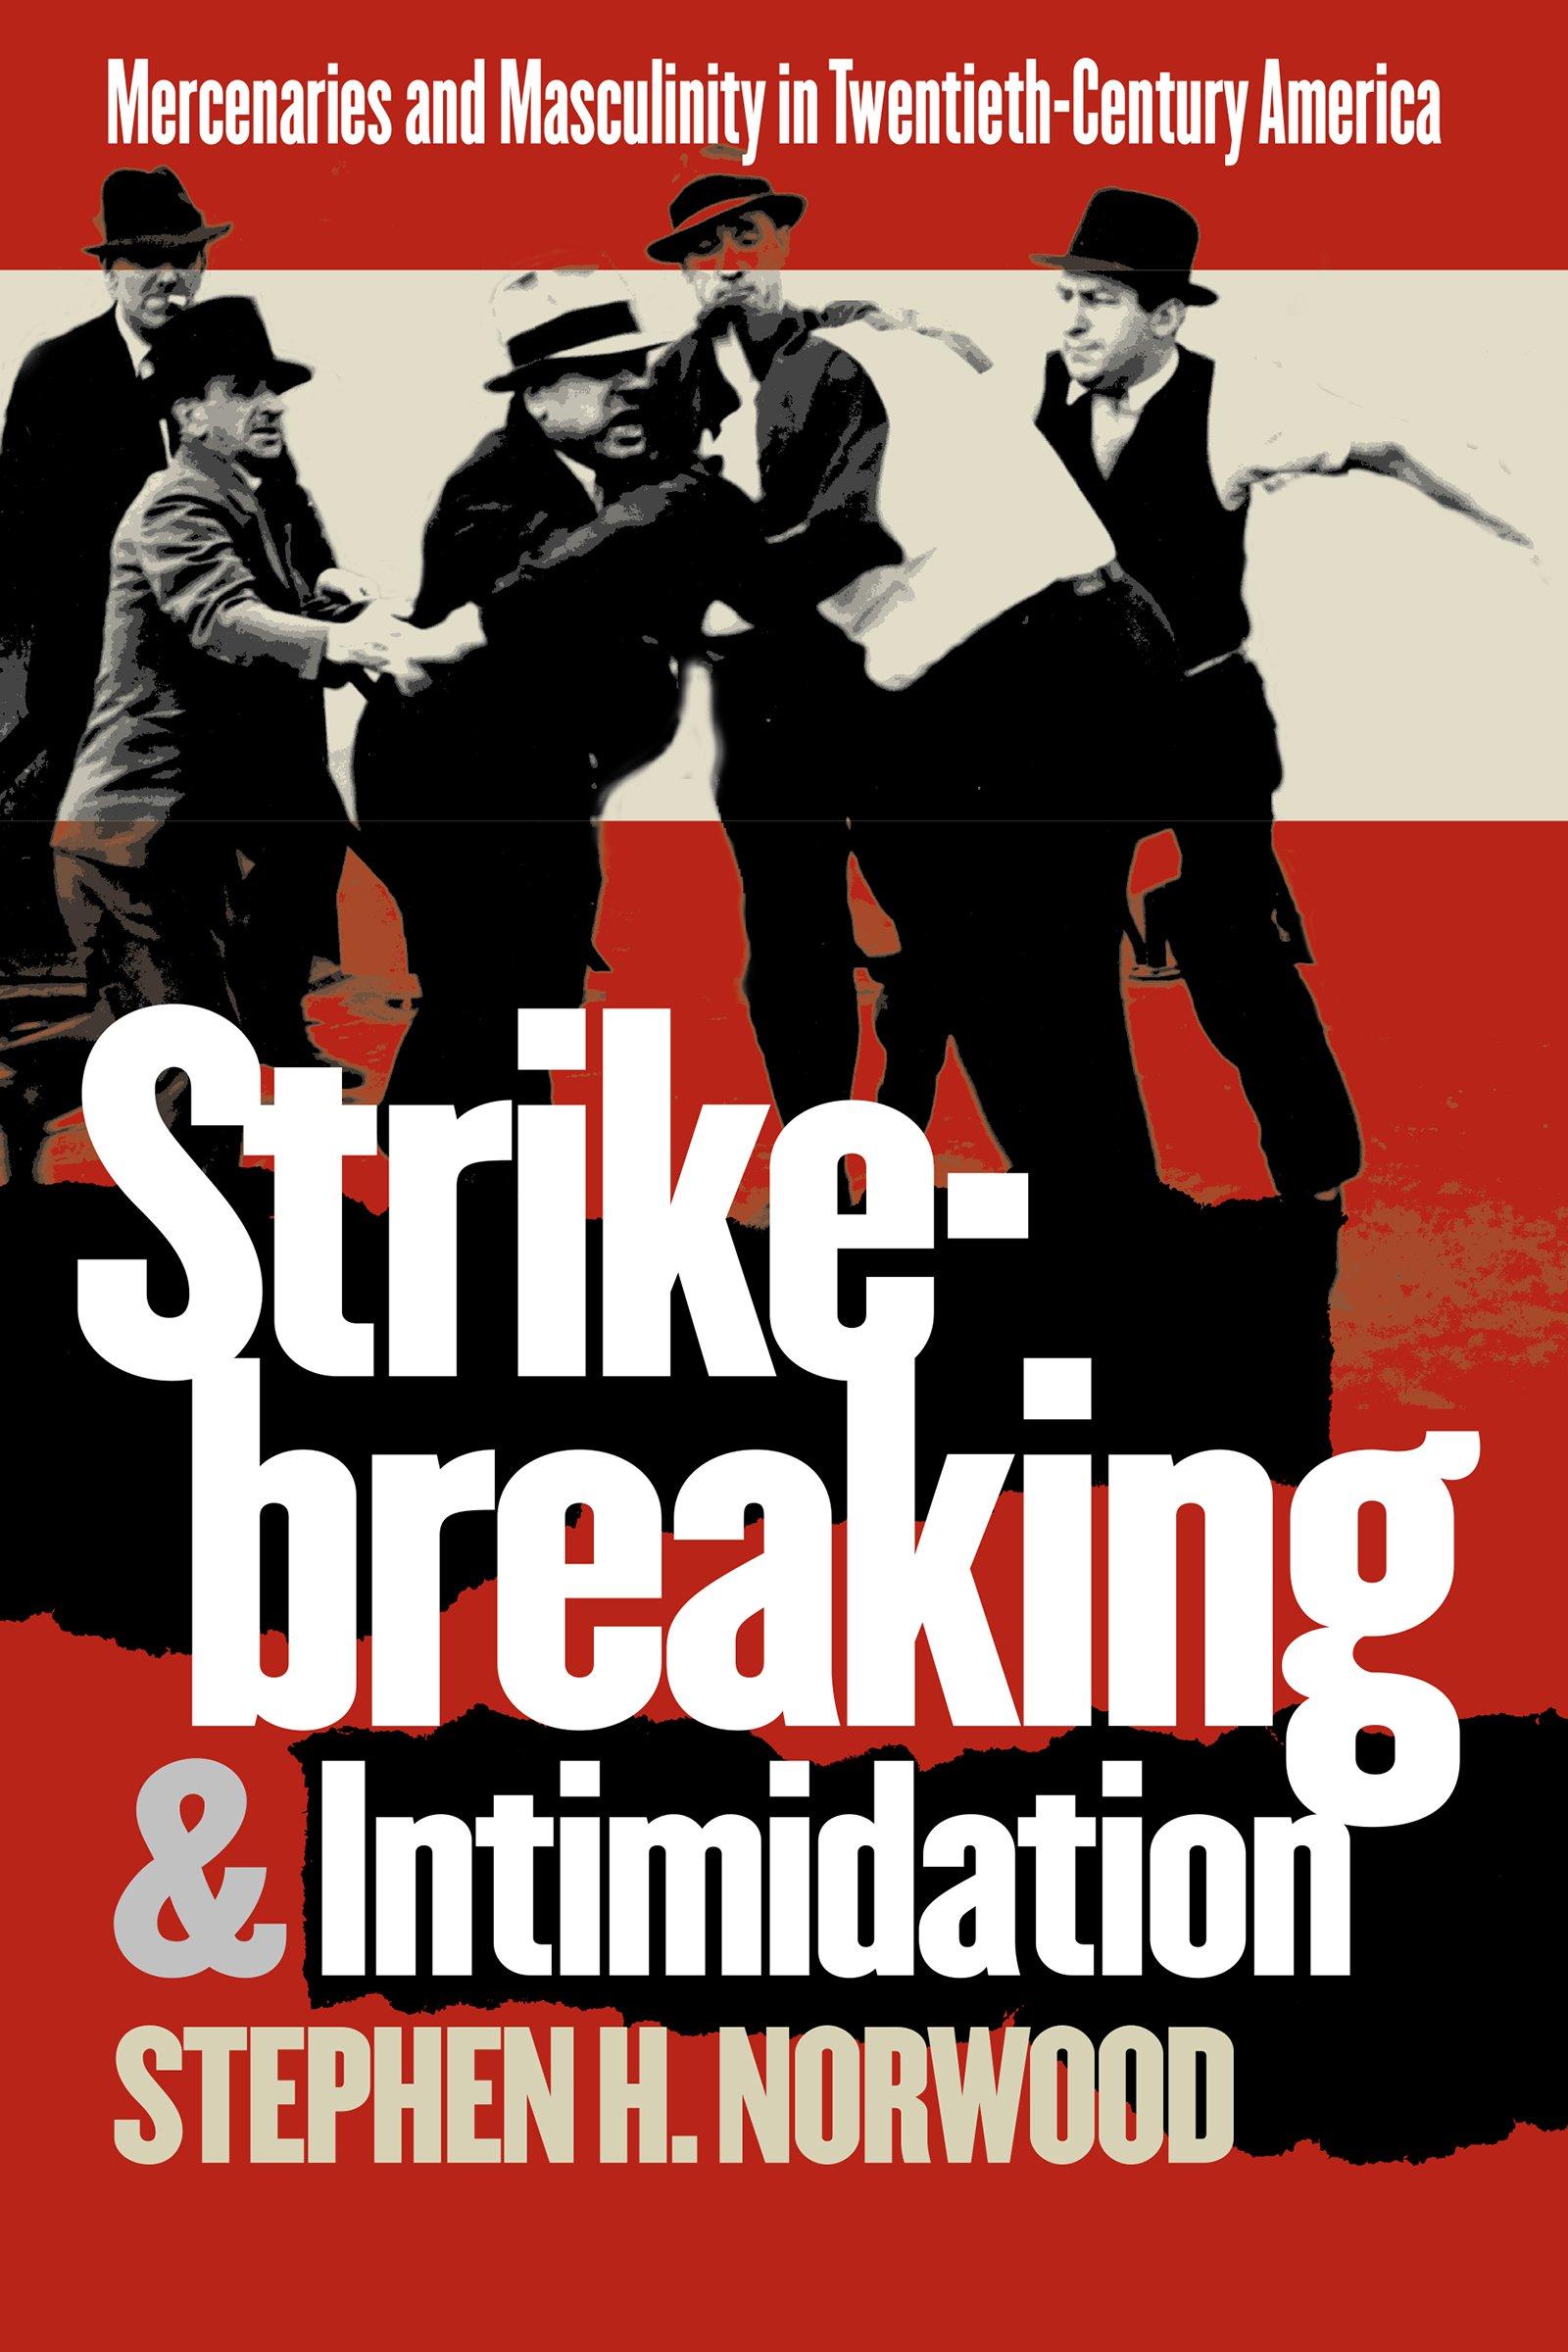 Strikebreaking and Intimidation: Mercenaries and Masculinity in Twentieth-Century America